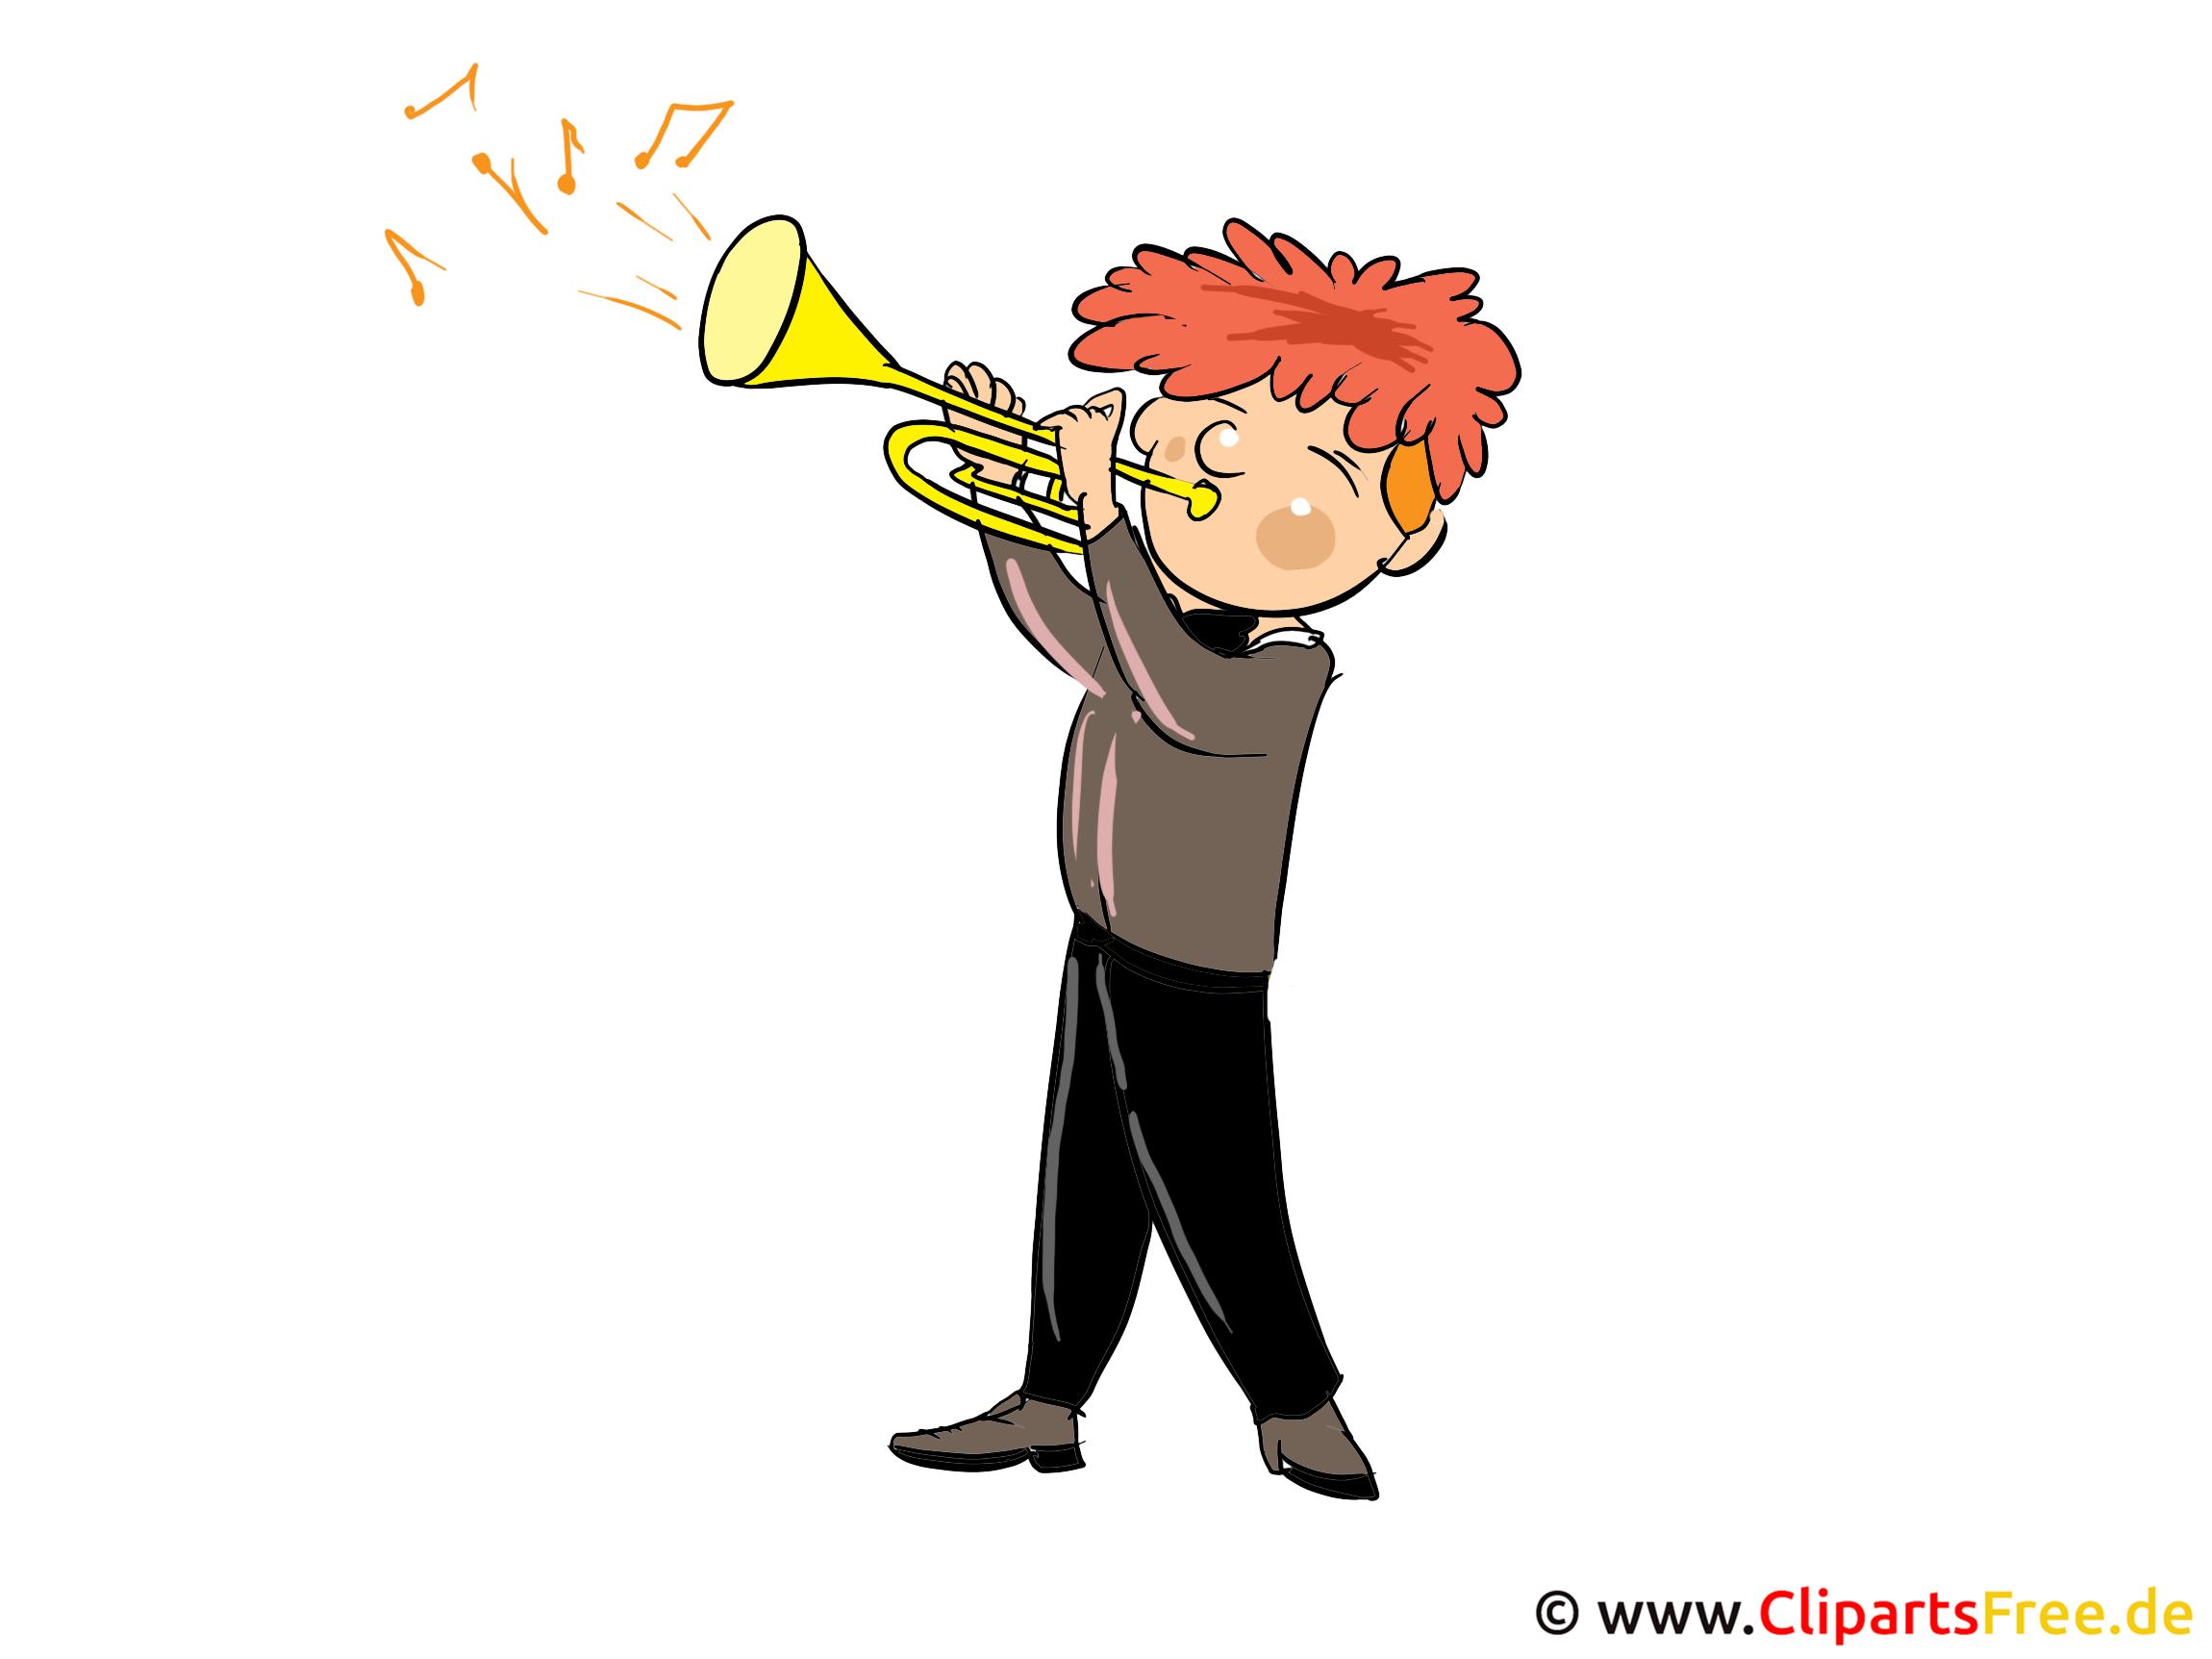 Musiker Bild, Clipart, Cartoon gratis